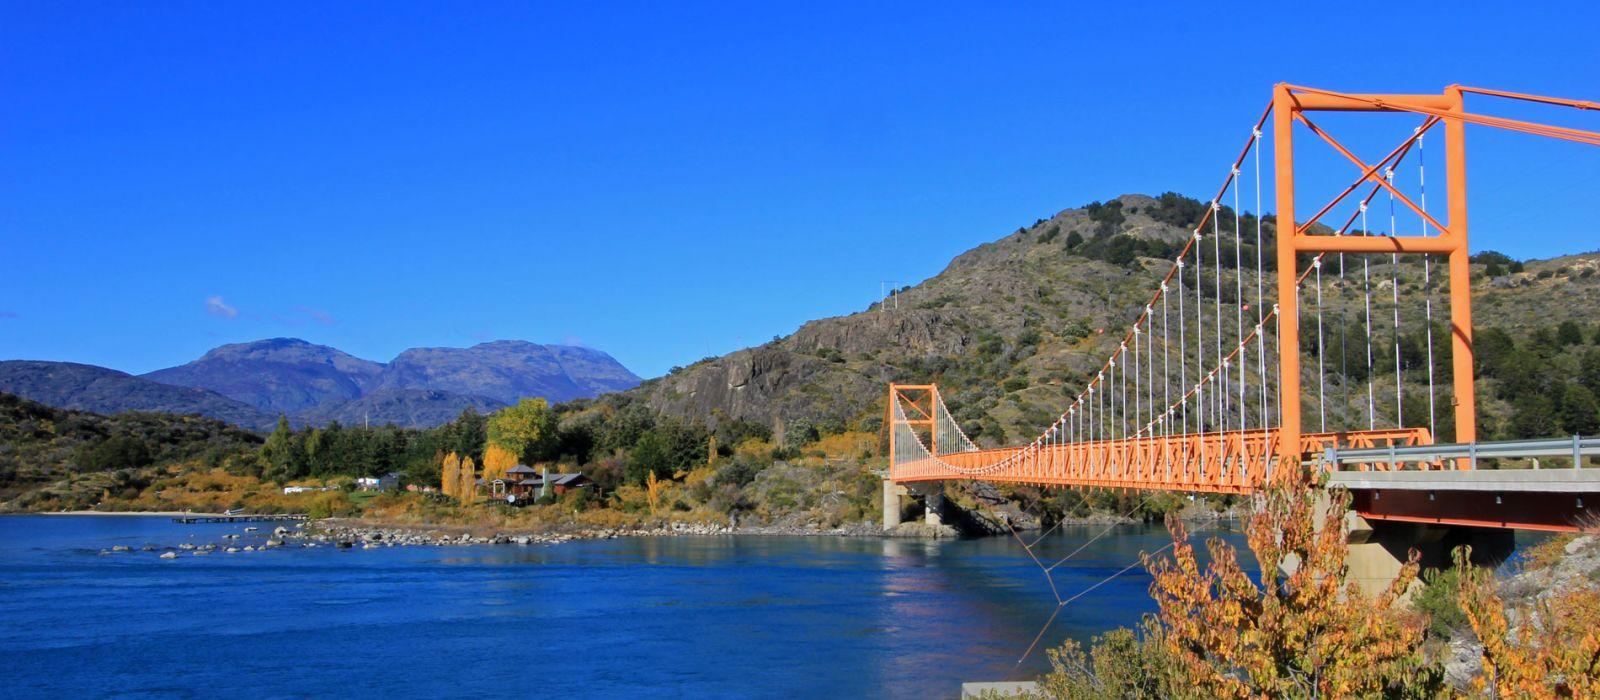 Reiseziel Lago Bertrand Chile